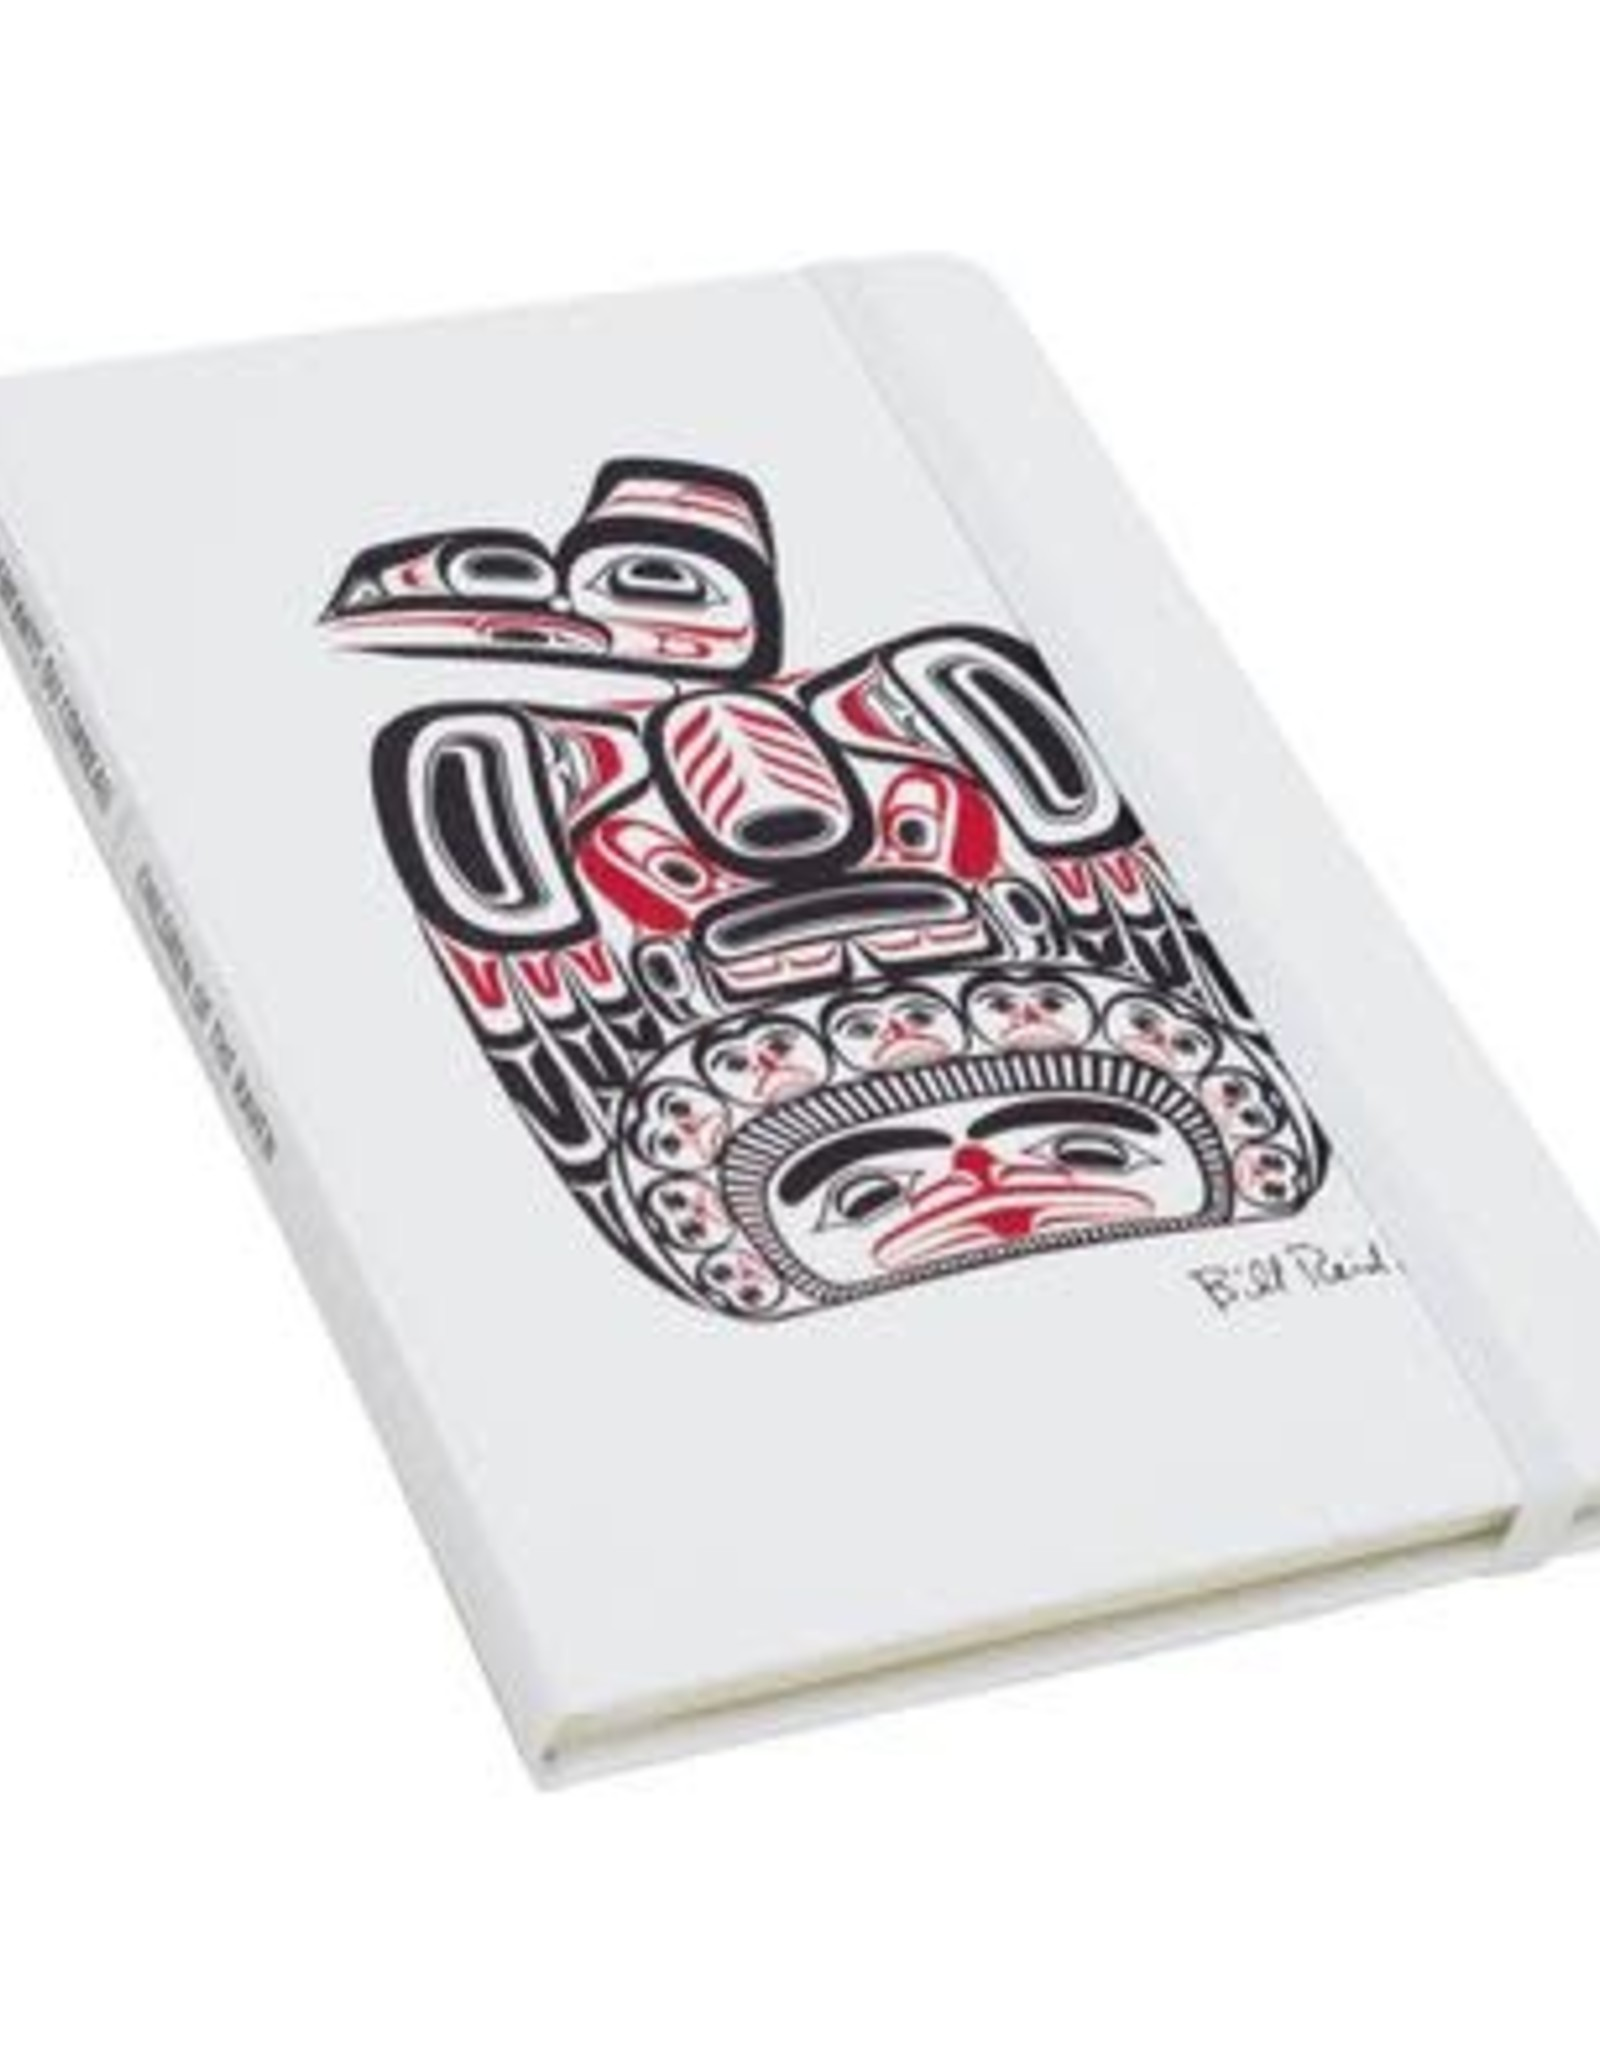 Journal - Children of the Raven by Bill Reid